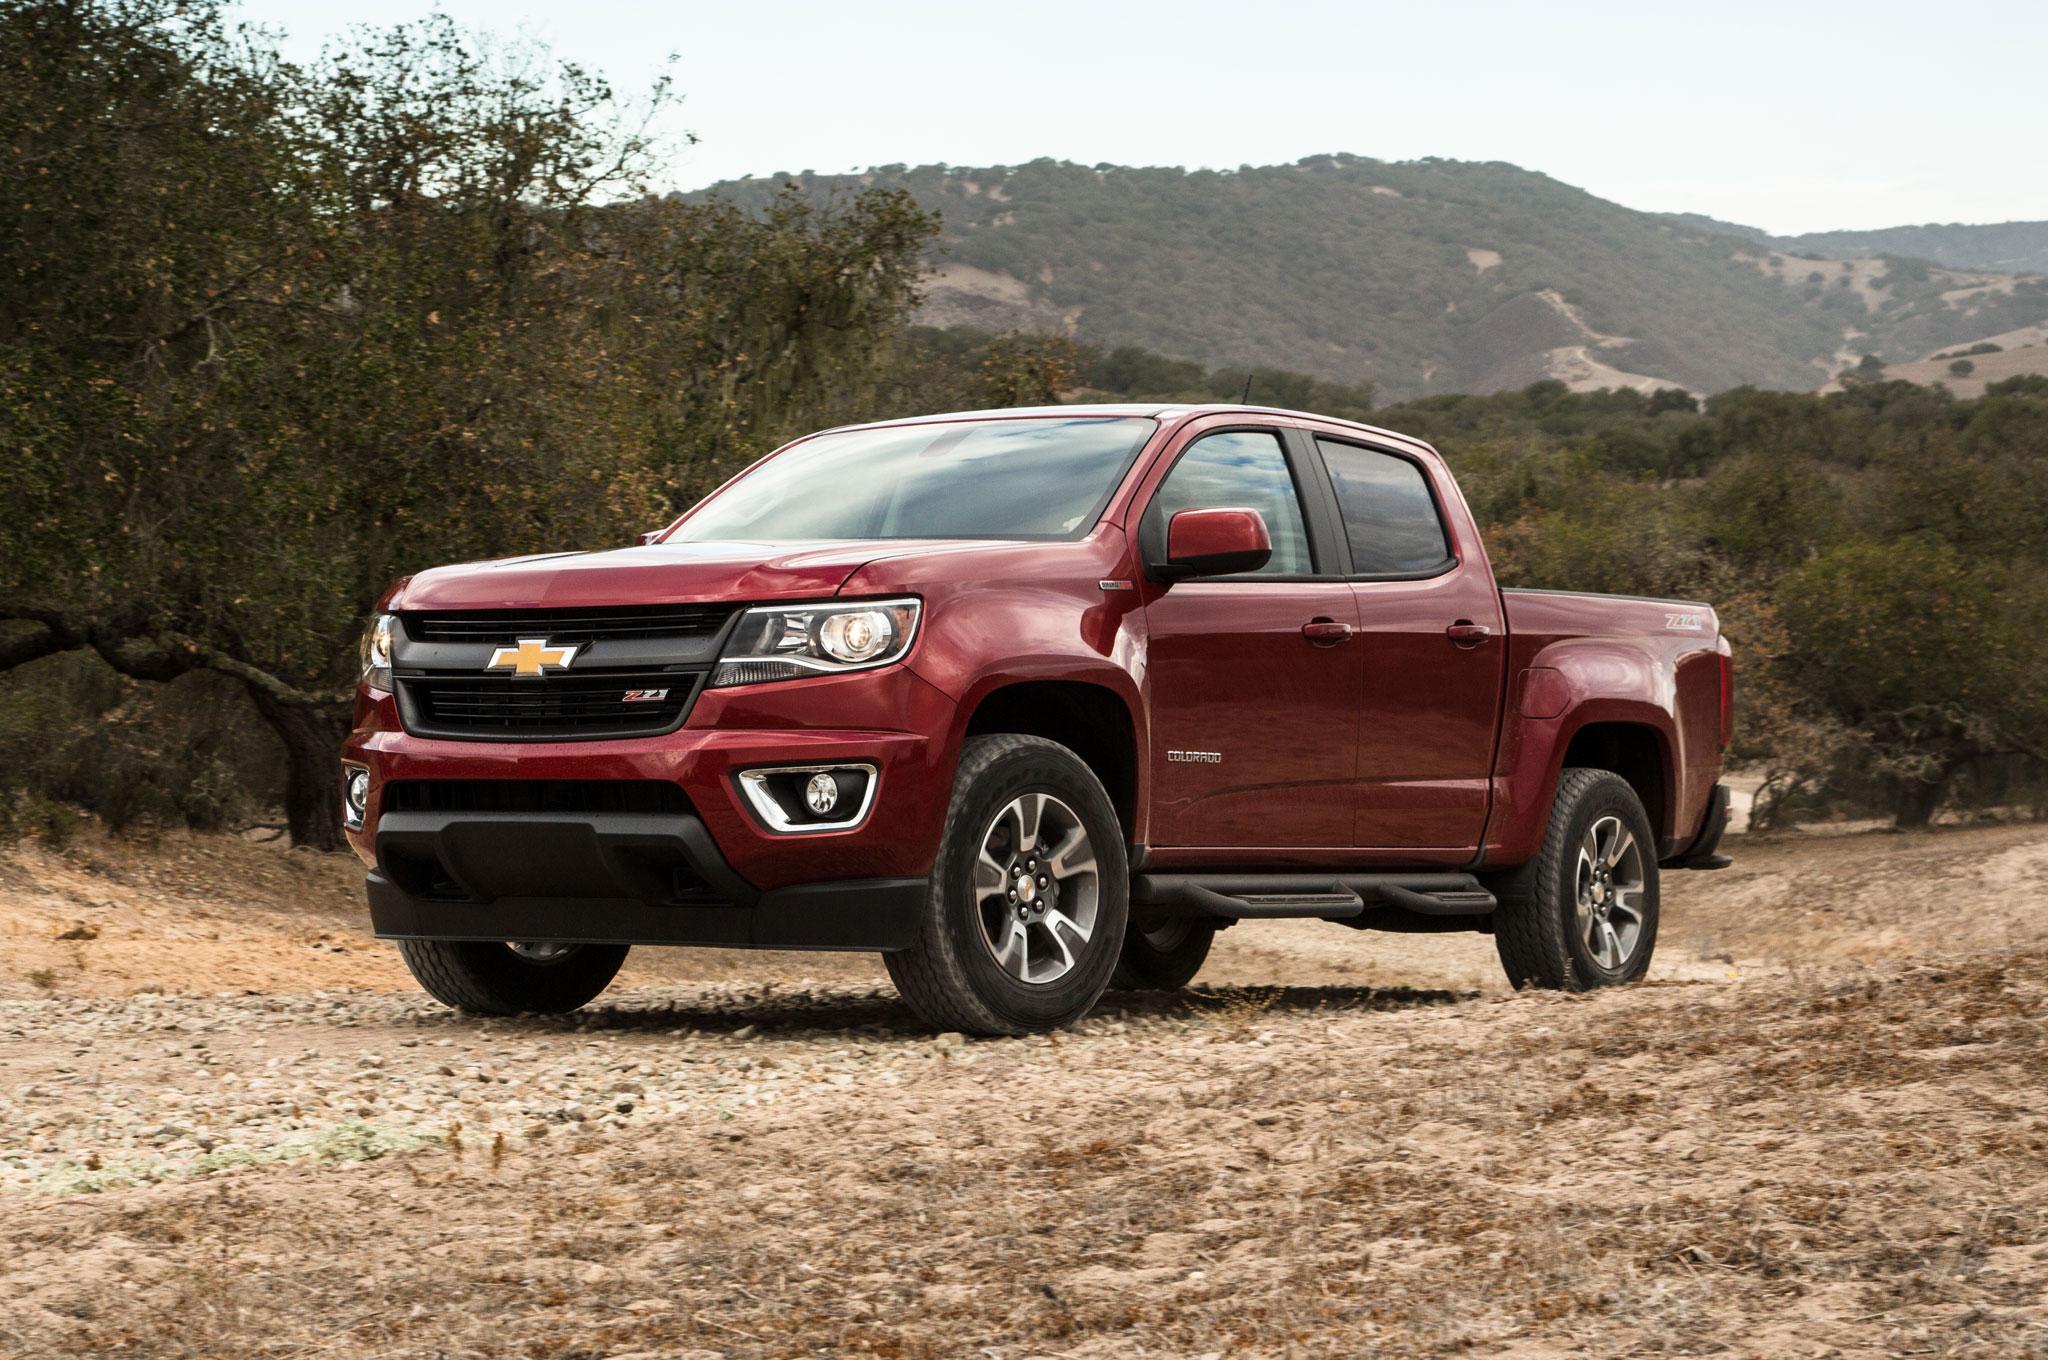 2016 Chevrolet Colorado Diesel Gets 31 MPG Highway